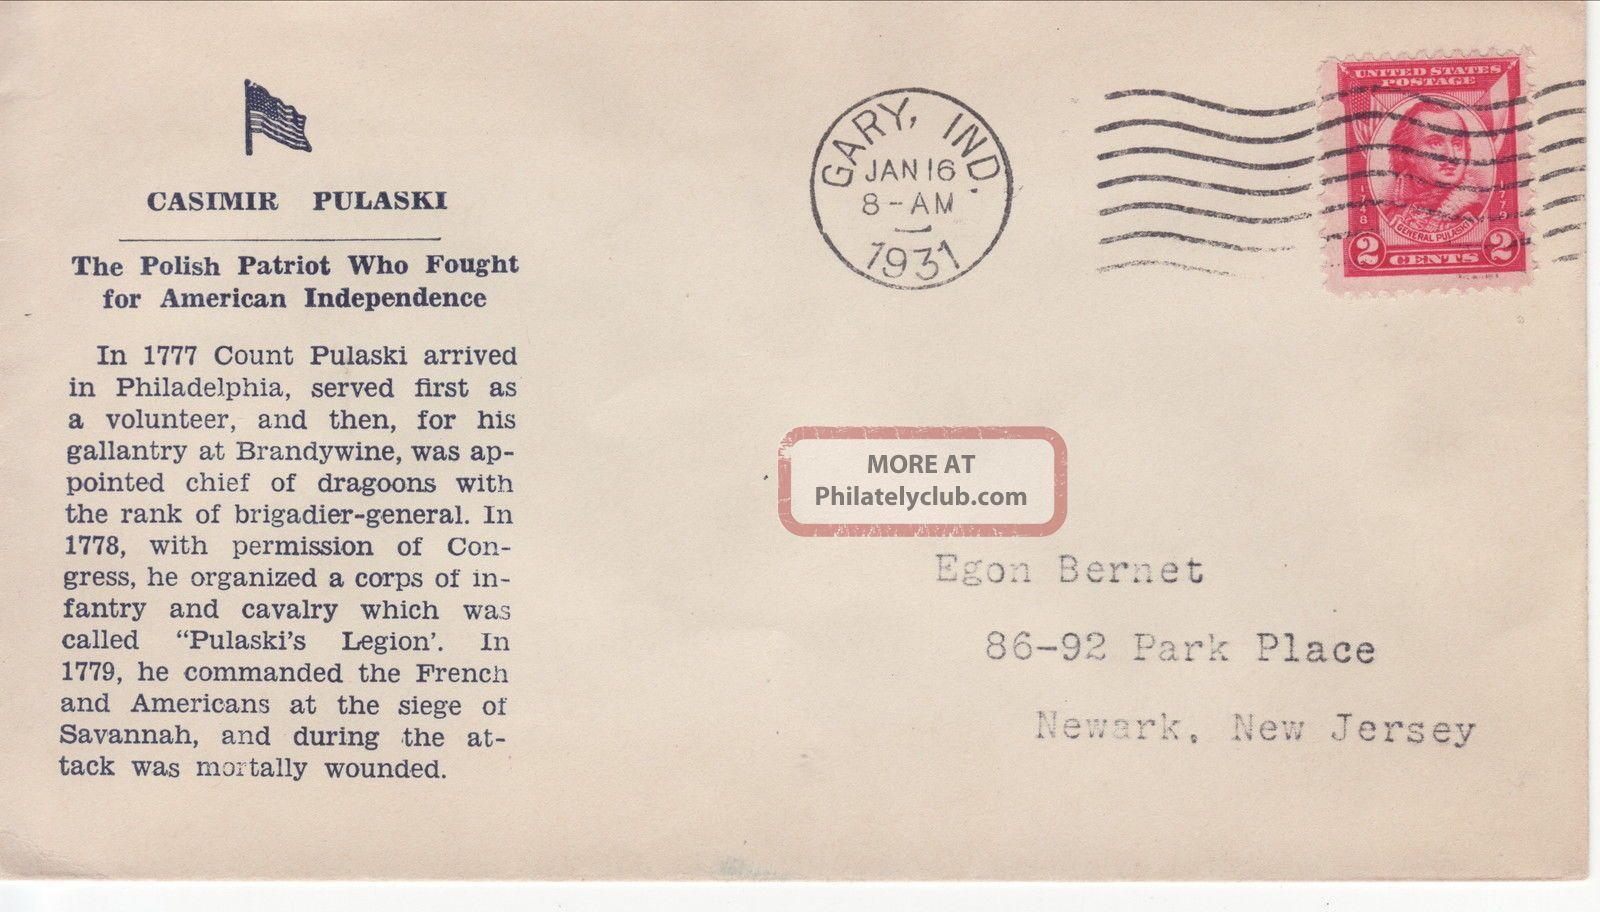 690 - 5 2c Pulaski,  Chicago Il 1/16/31,  S,  Newark Stamp & Coin/bernet (red) FDCs (pre-1951) photo